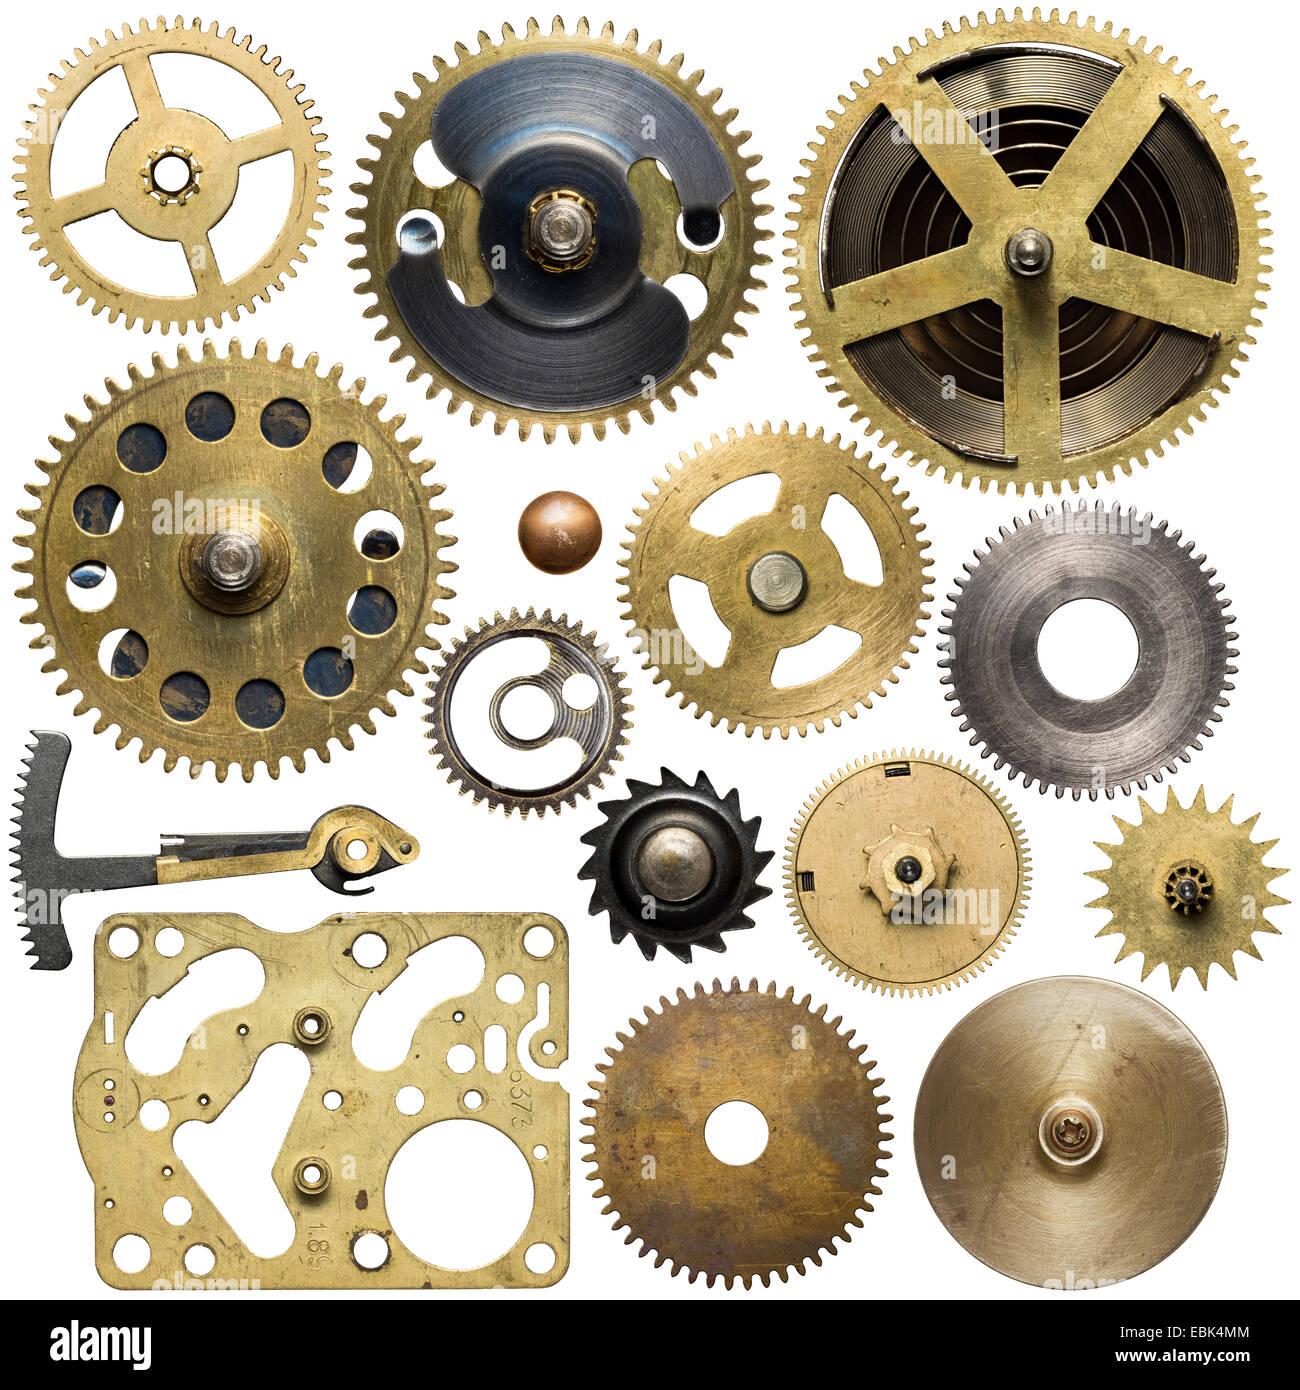 Clockwork spare parts. Metal gear, cogwheels. - Stock Image